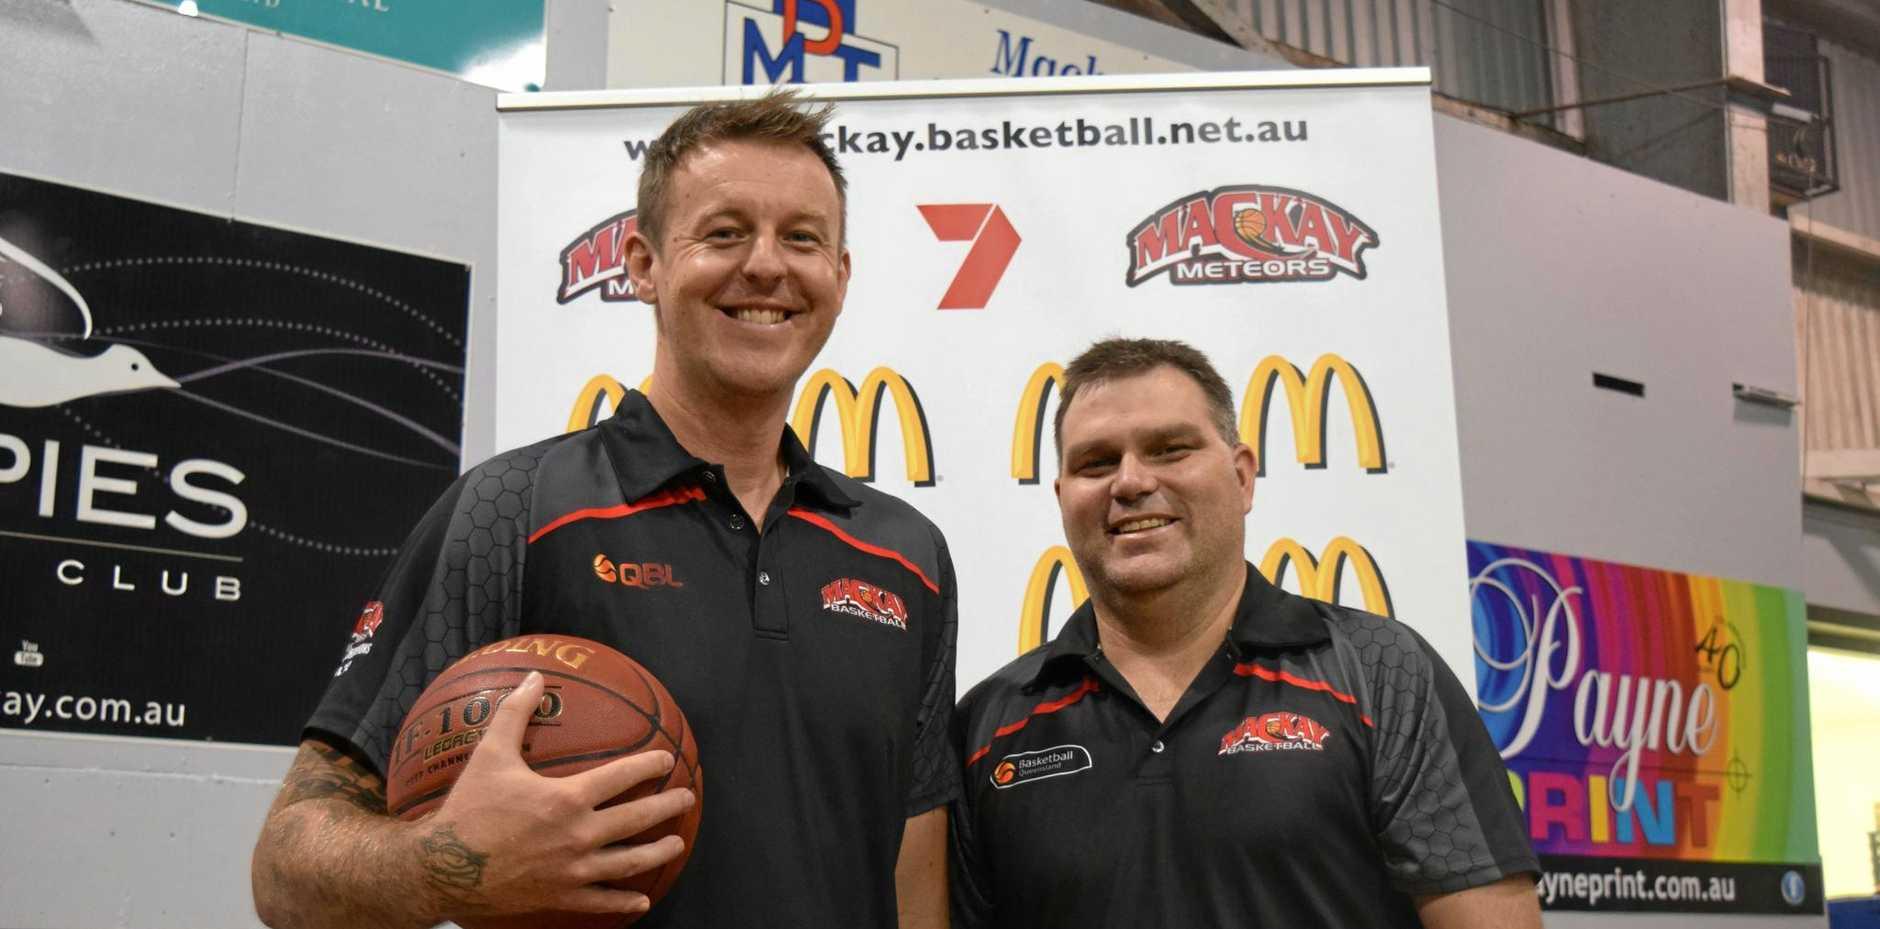 FRESH FACES: New Mackay Meteors head coach Cameron Tragardh and business development manager Wade Rebetzke.